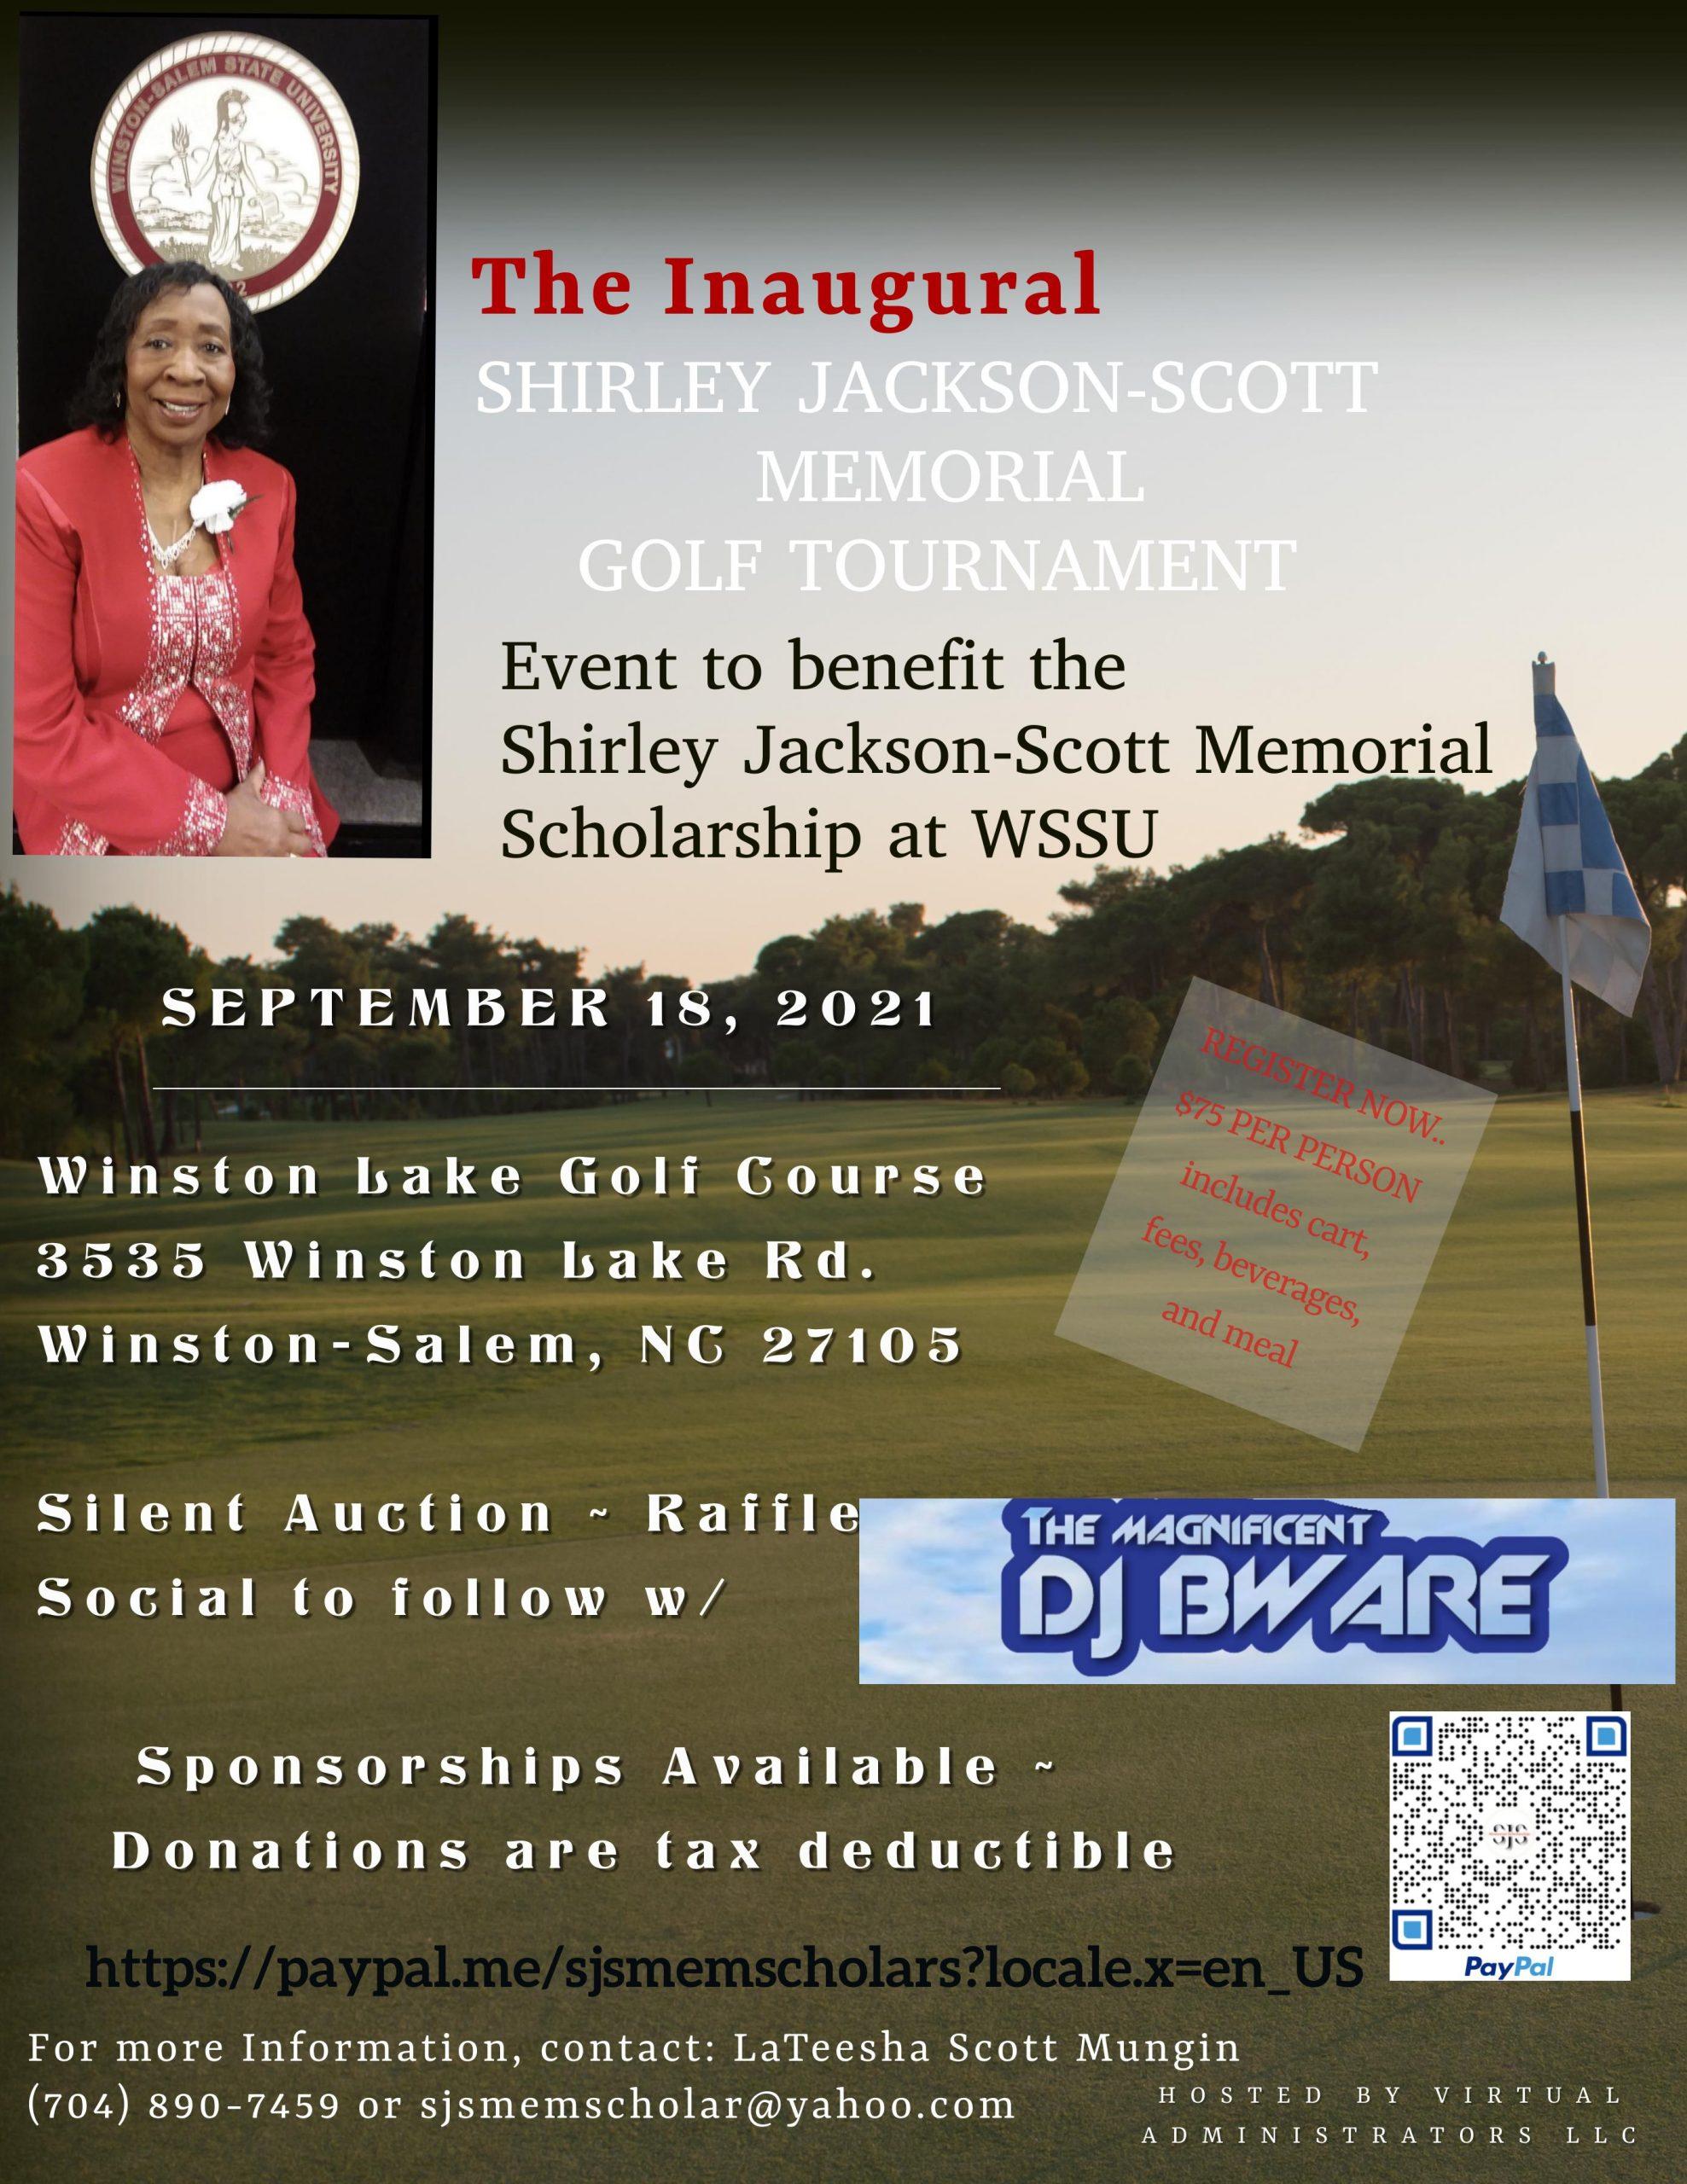 The Inaugural Shirley Jackson Scott Memorial Golf Tournament